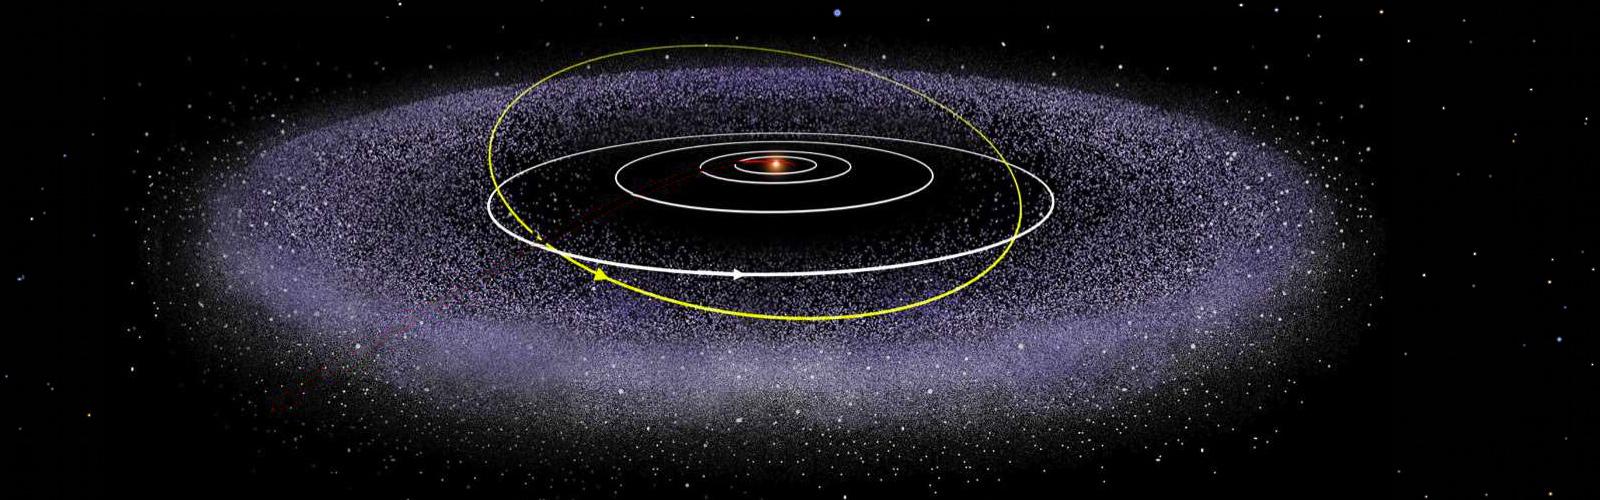 overview kuiper belt solar system exploration nasa science